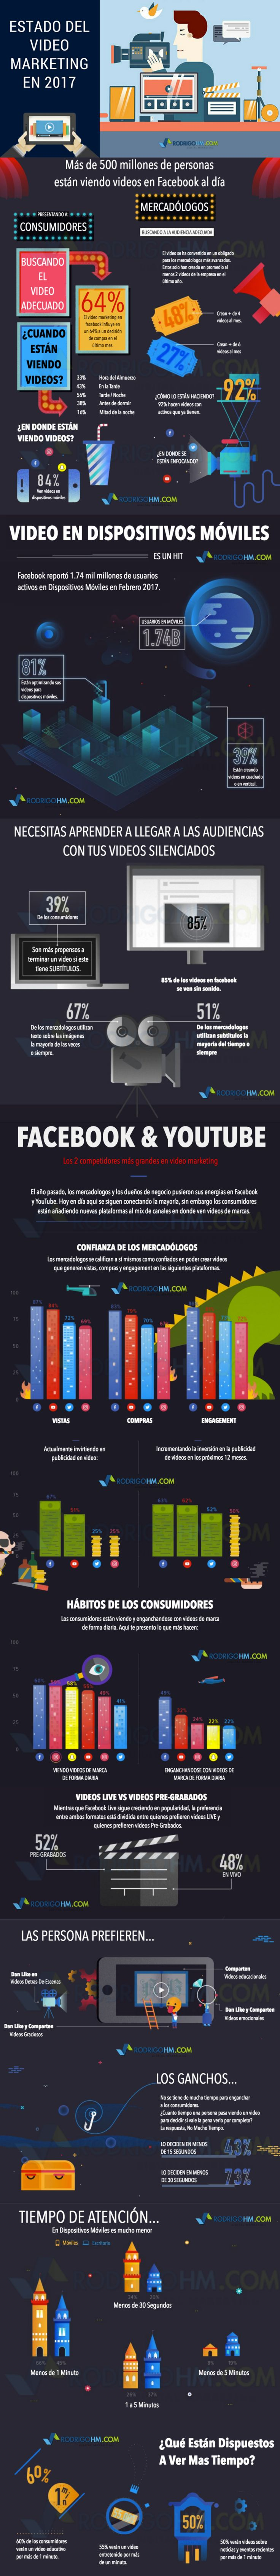 El estado del vídeo marketing #infografia